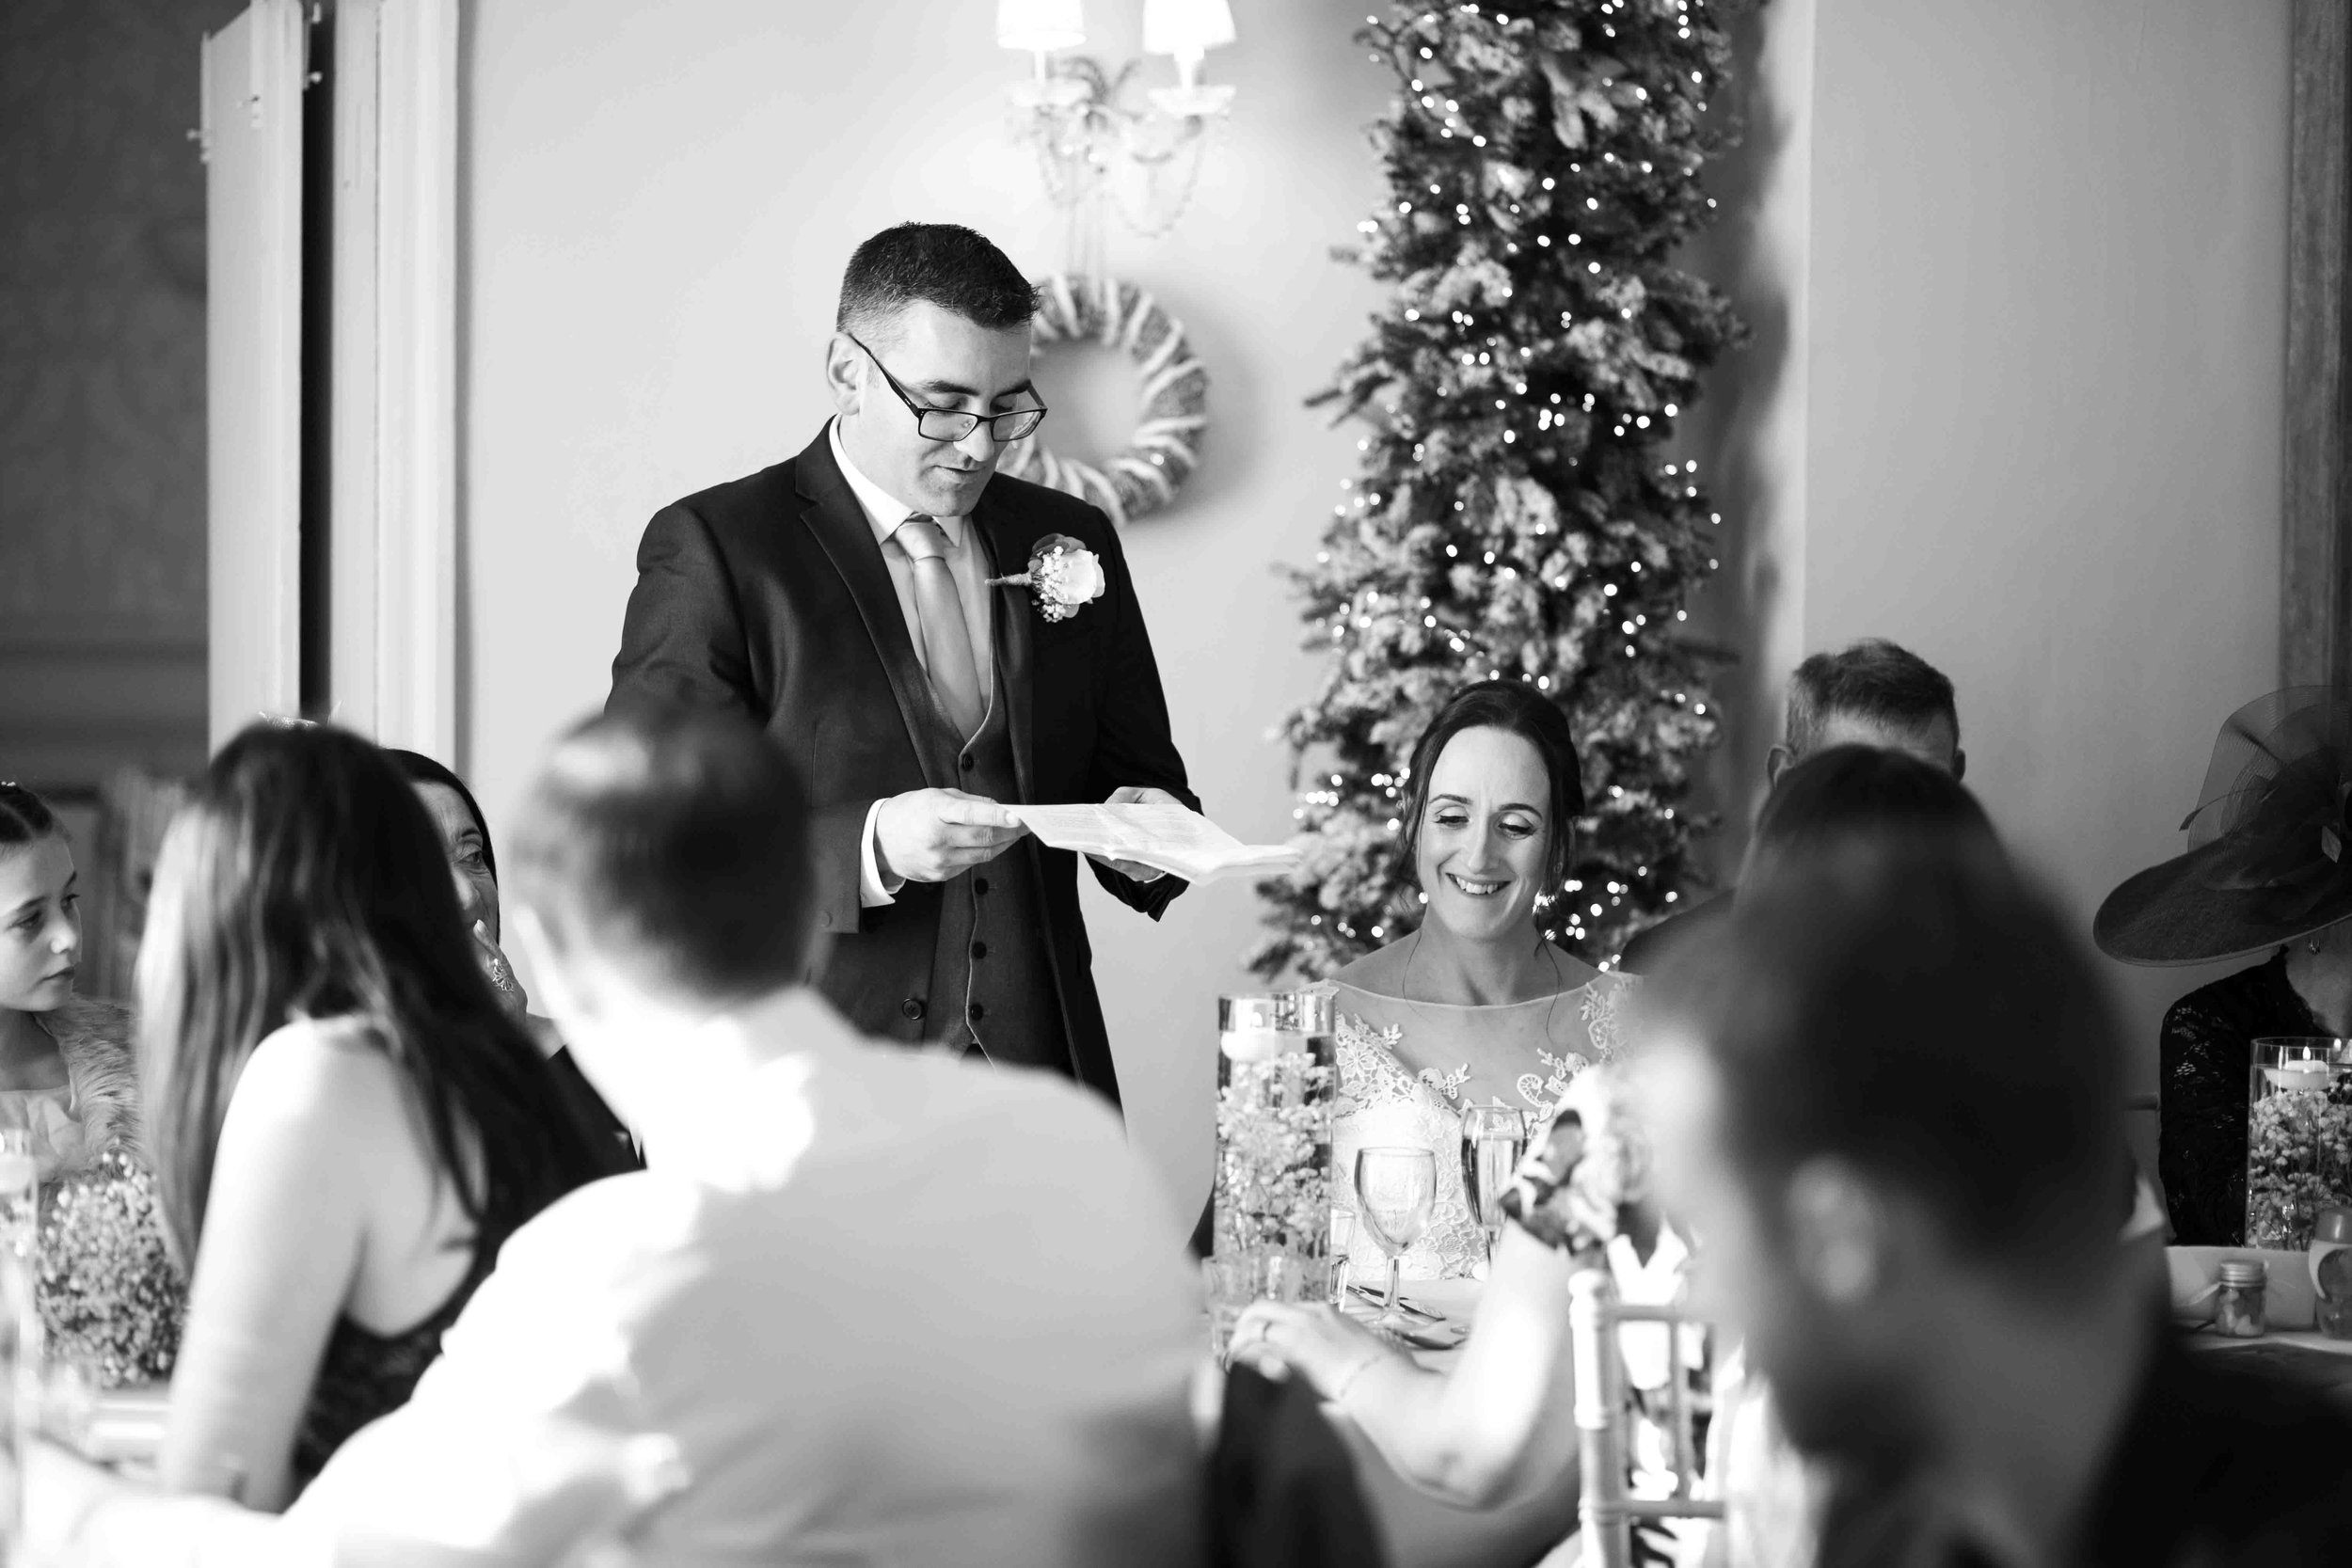 wedding-photos-willenhall-wedding-photographer-wolverhampton-wedding-photographer-west-midlands-wedding-photographer-birmingham-groom-doing-speech.jpg